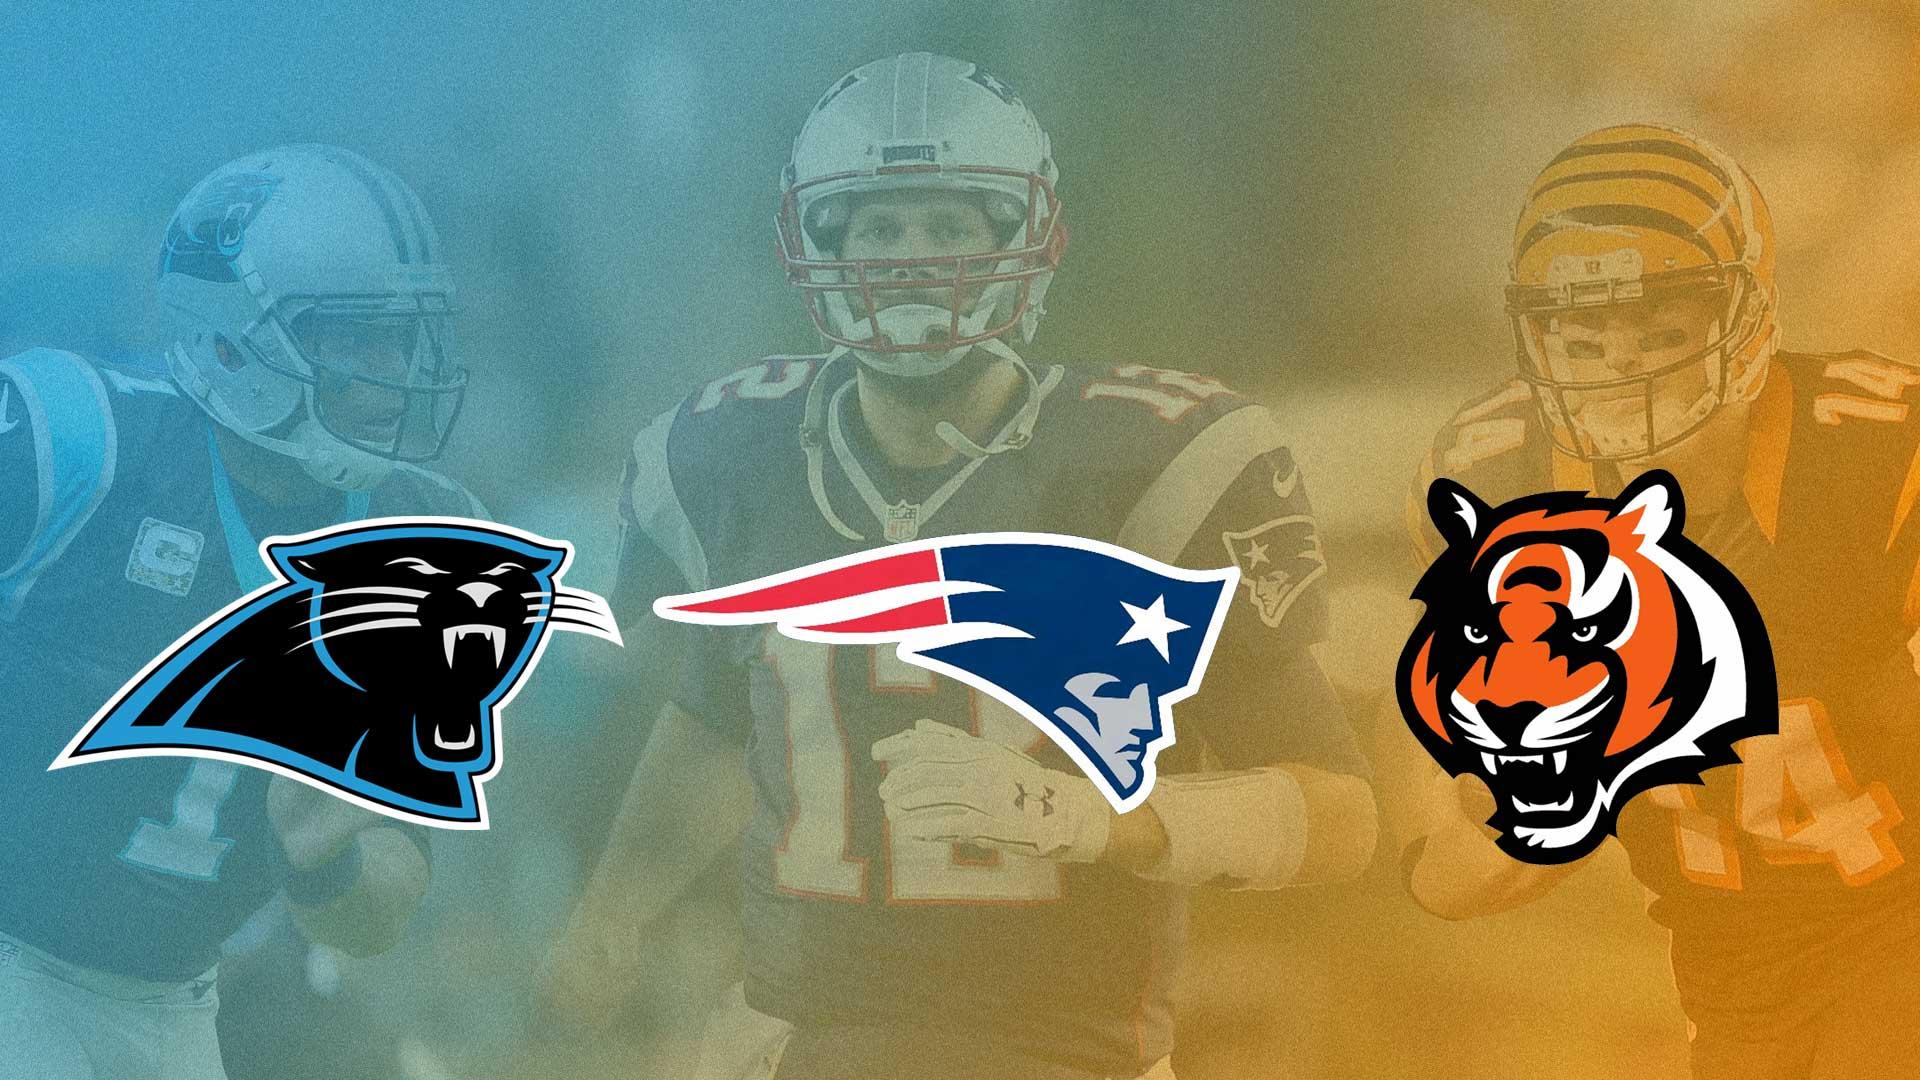 Nfl Printable Week 5 Panthers Patriots Bengals Getty Illo Ftr Yveojjxdkudijbcfnqt